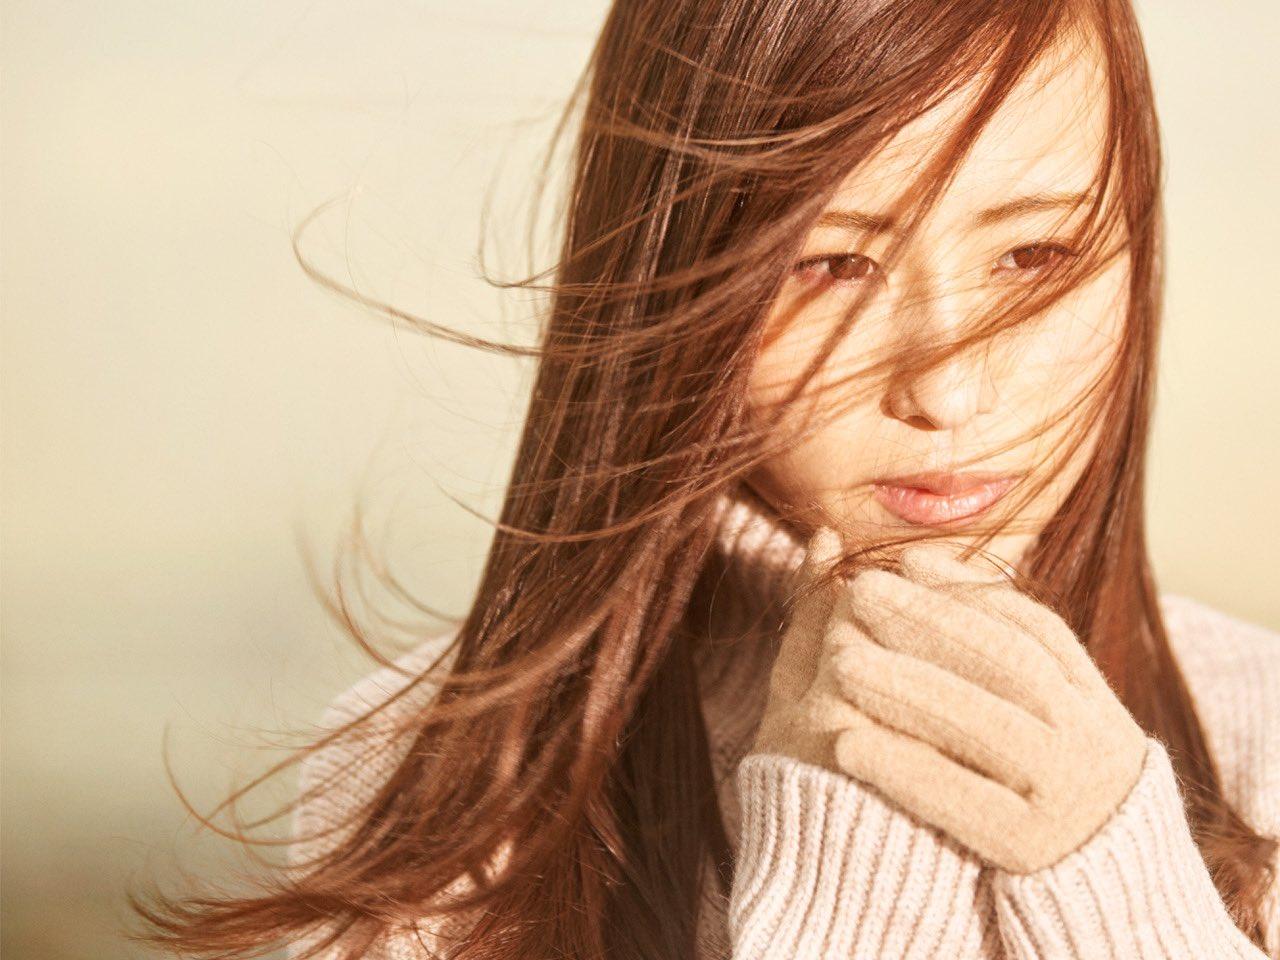 Uruの年齢は何歳・本名は?素顔がかわいい美人と話題!歌手の経歴も紹介!